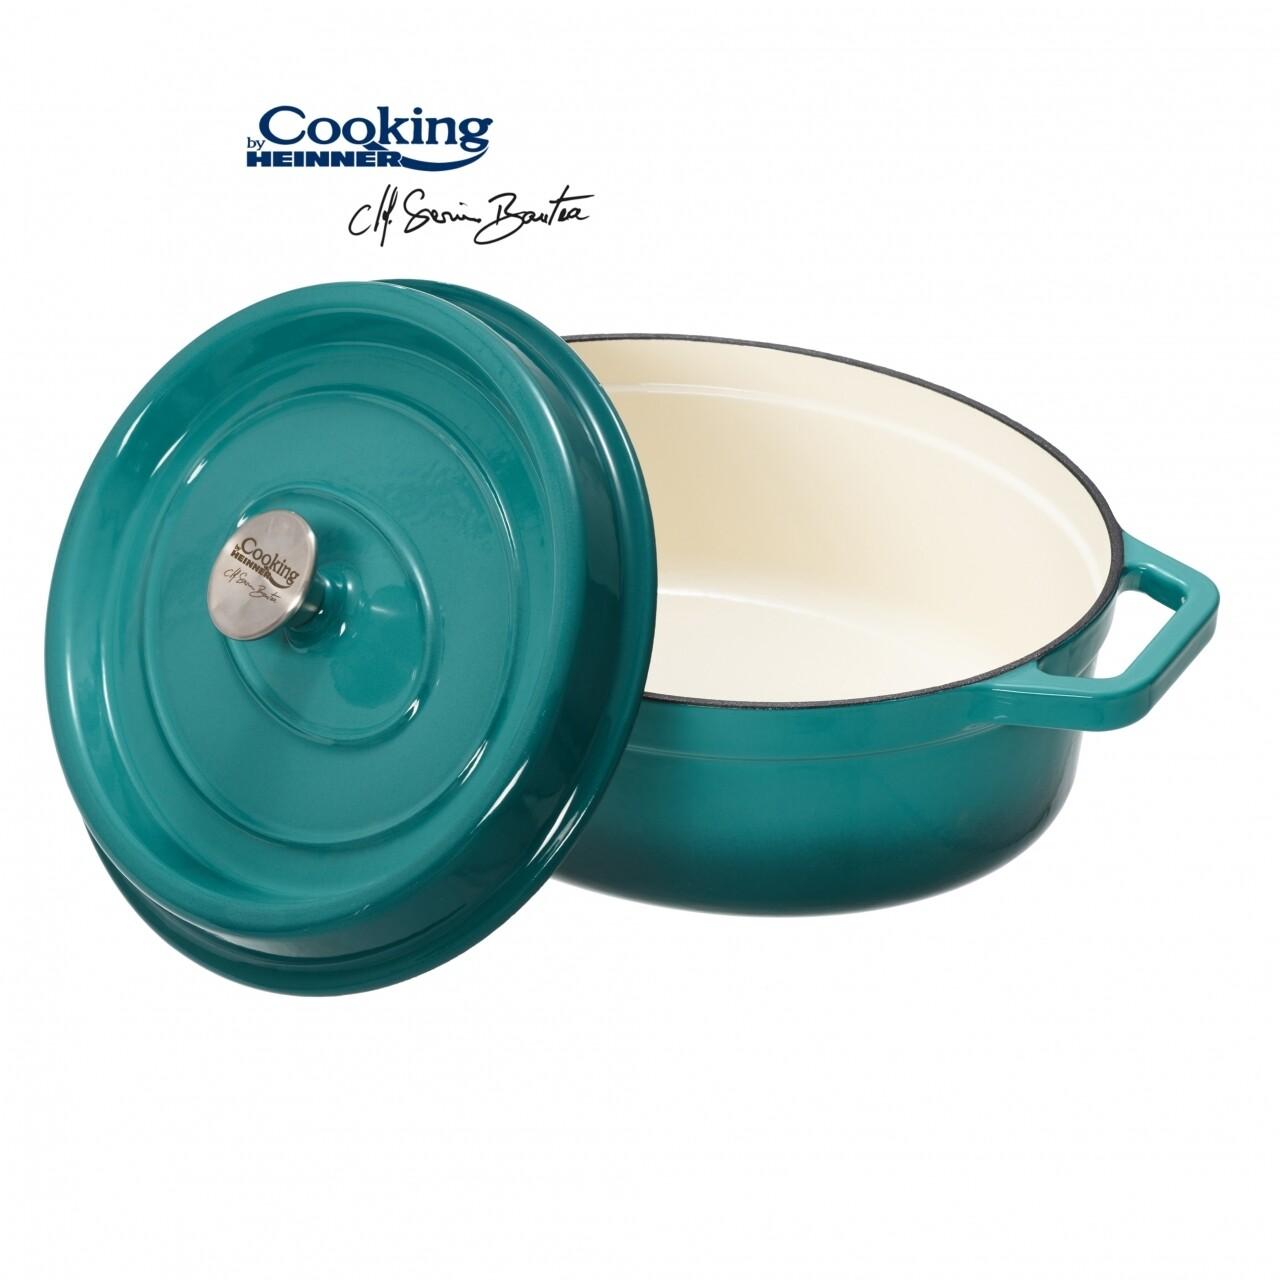 Cratita emailata, Cooking by Heinner, 5.9 l, fonta, bej si bleu